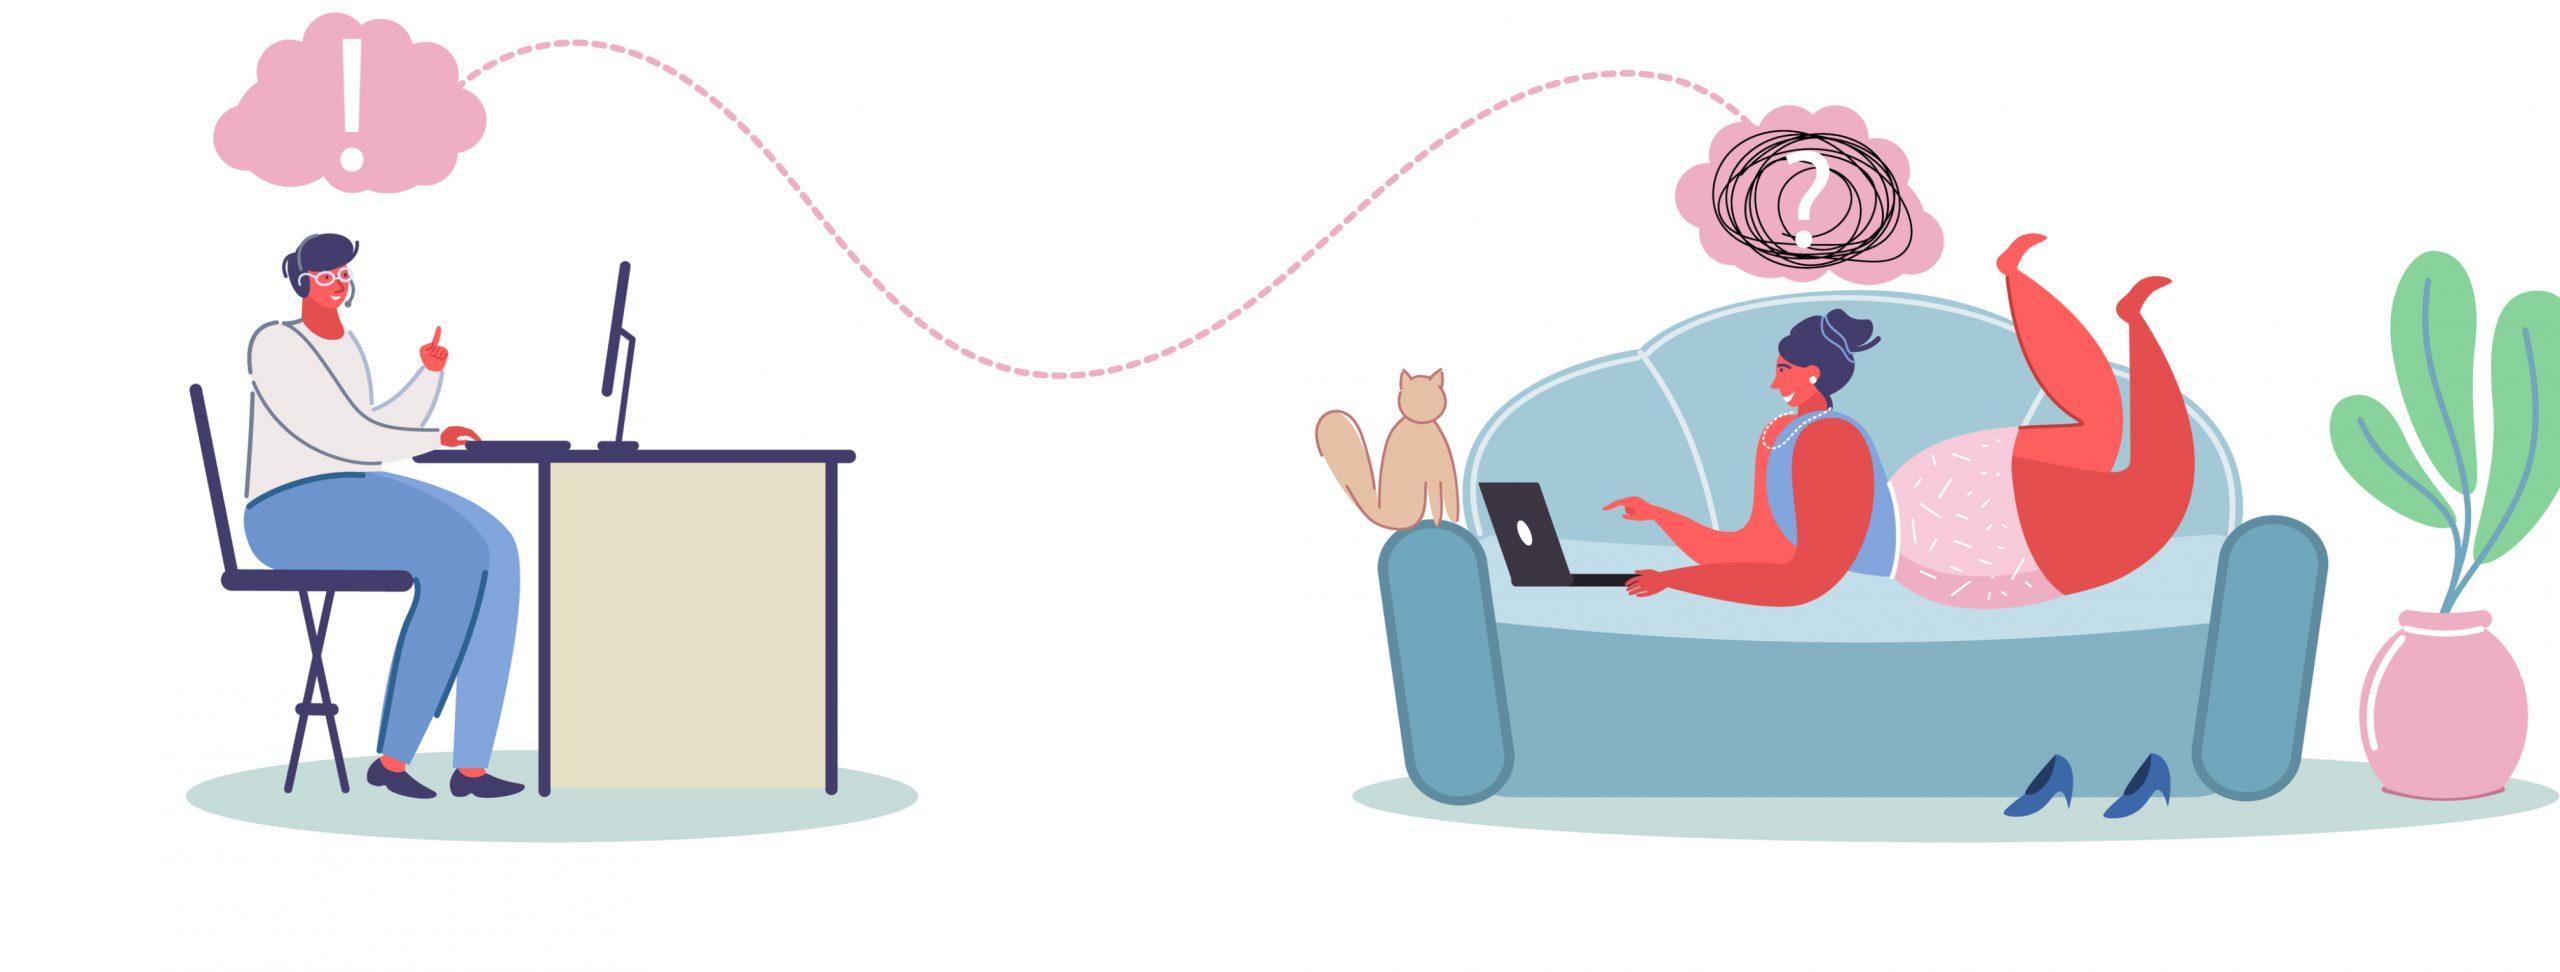 Teletherapy Illustration